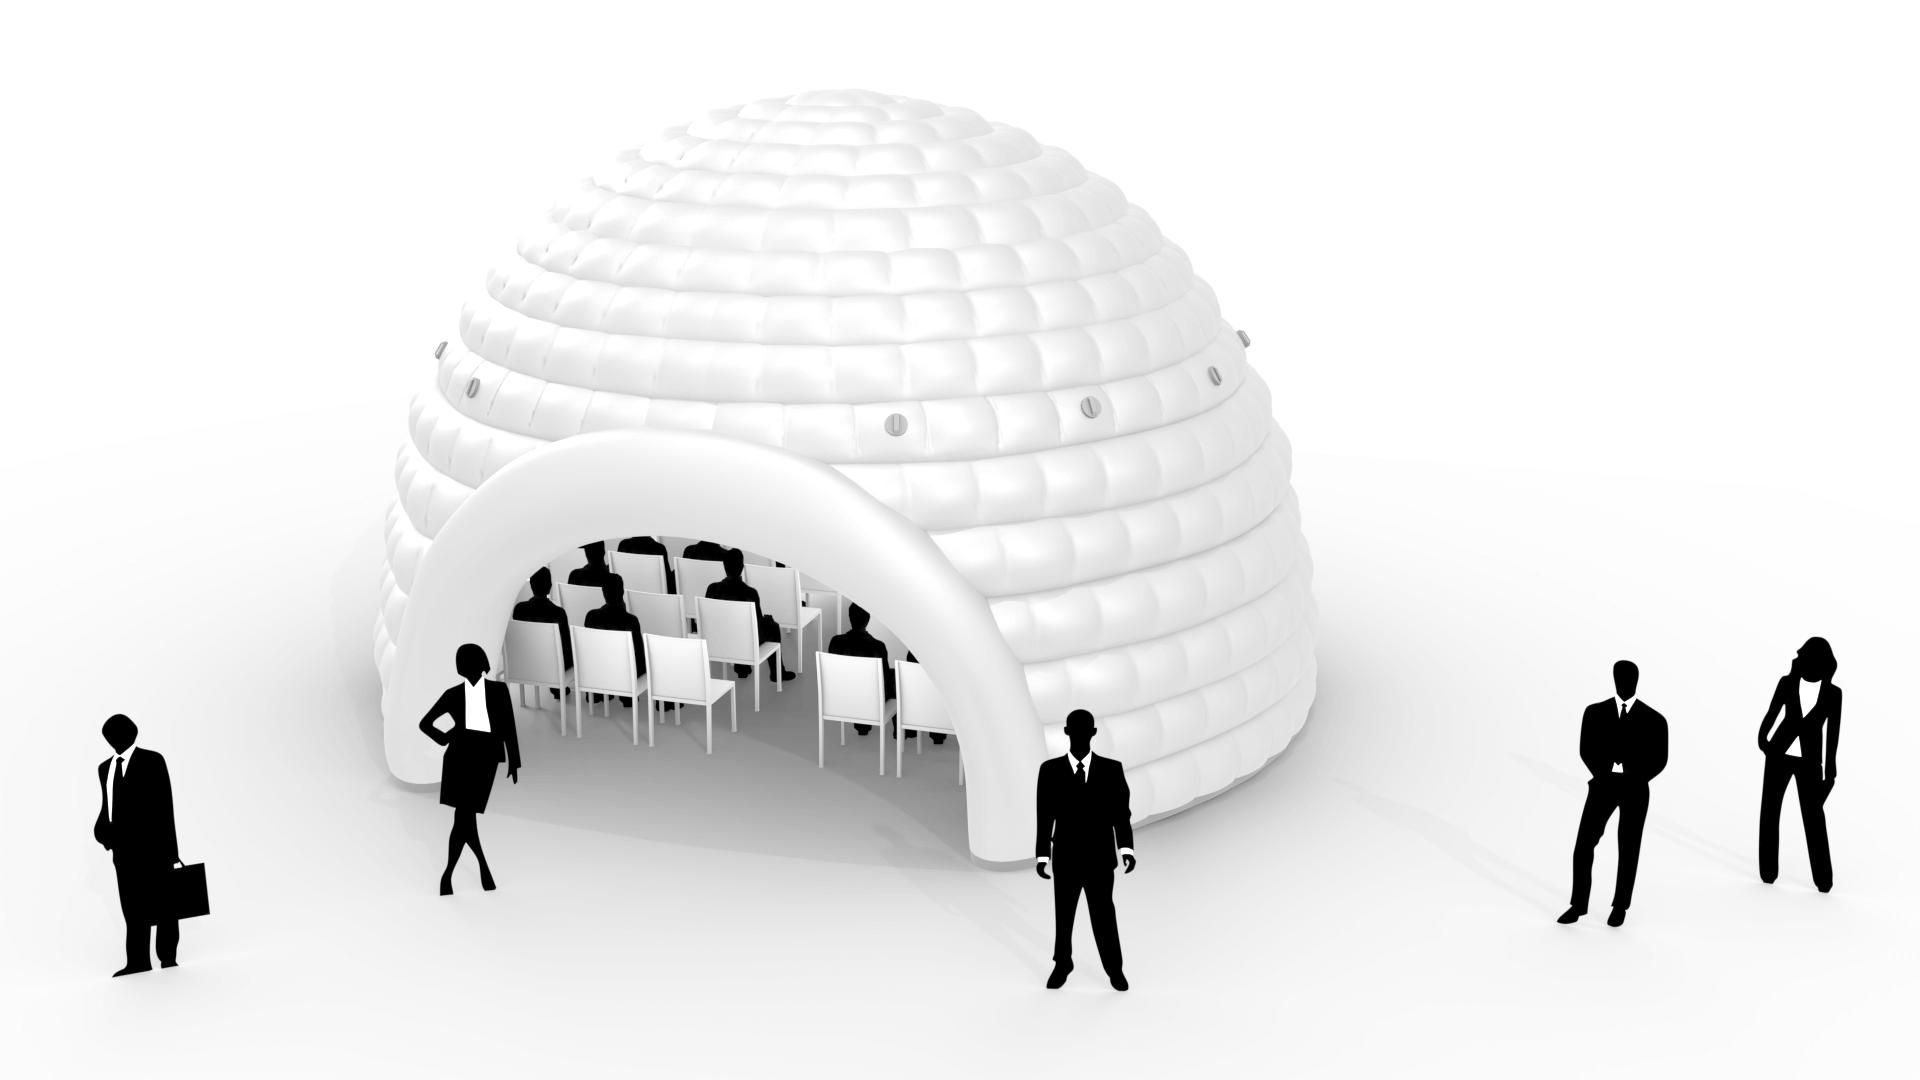 QuickSpace dome 8m vector image